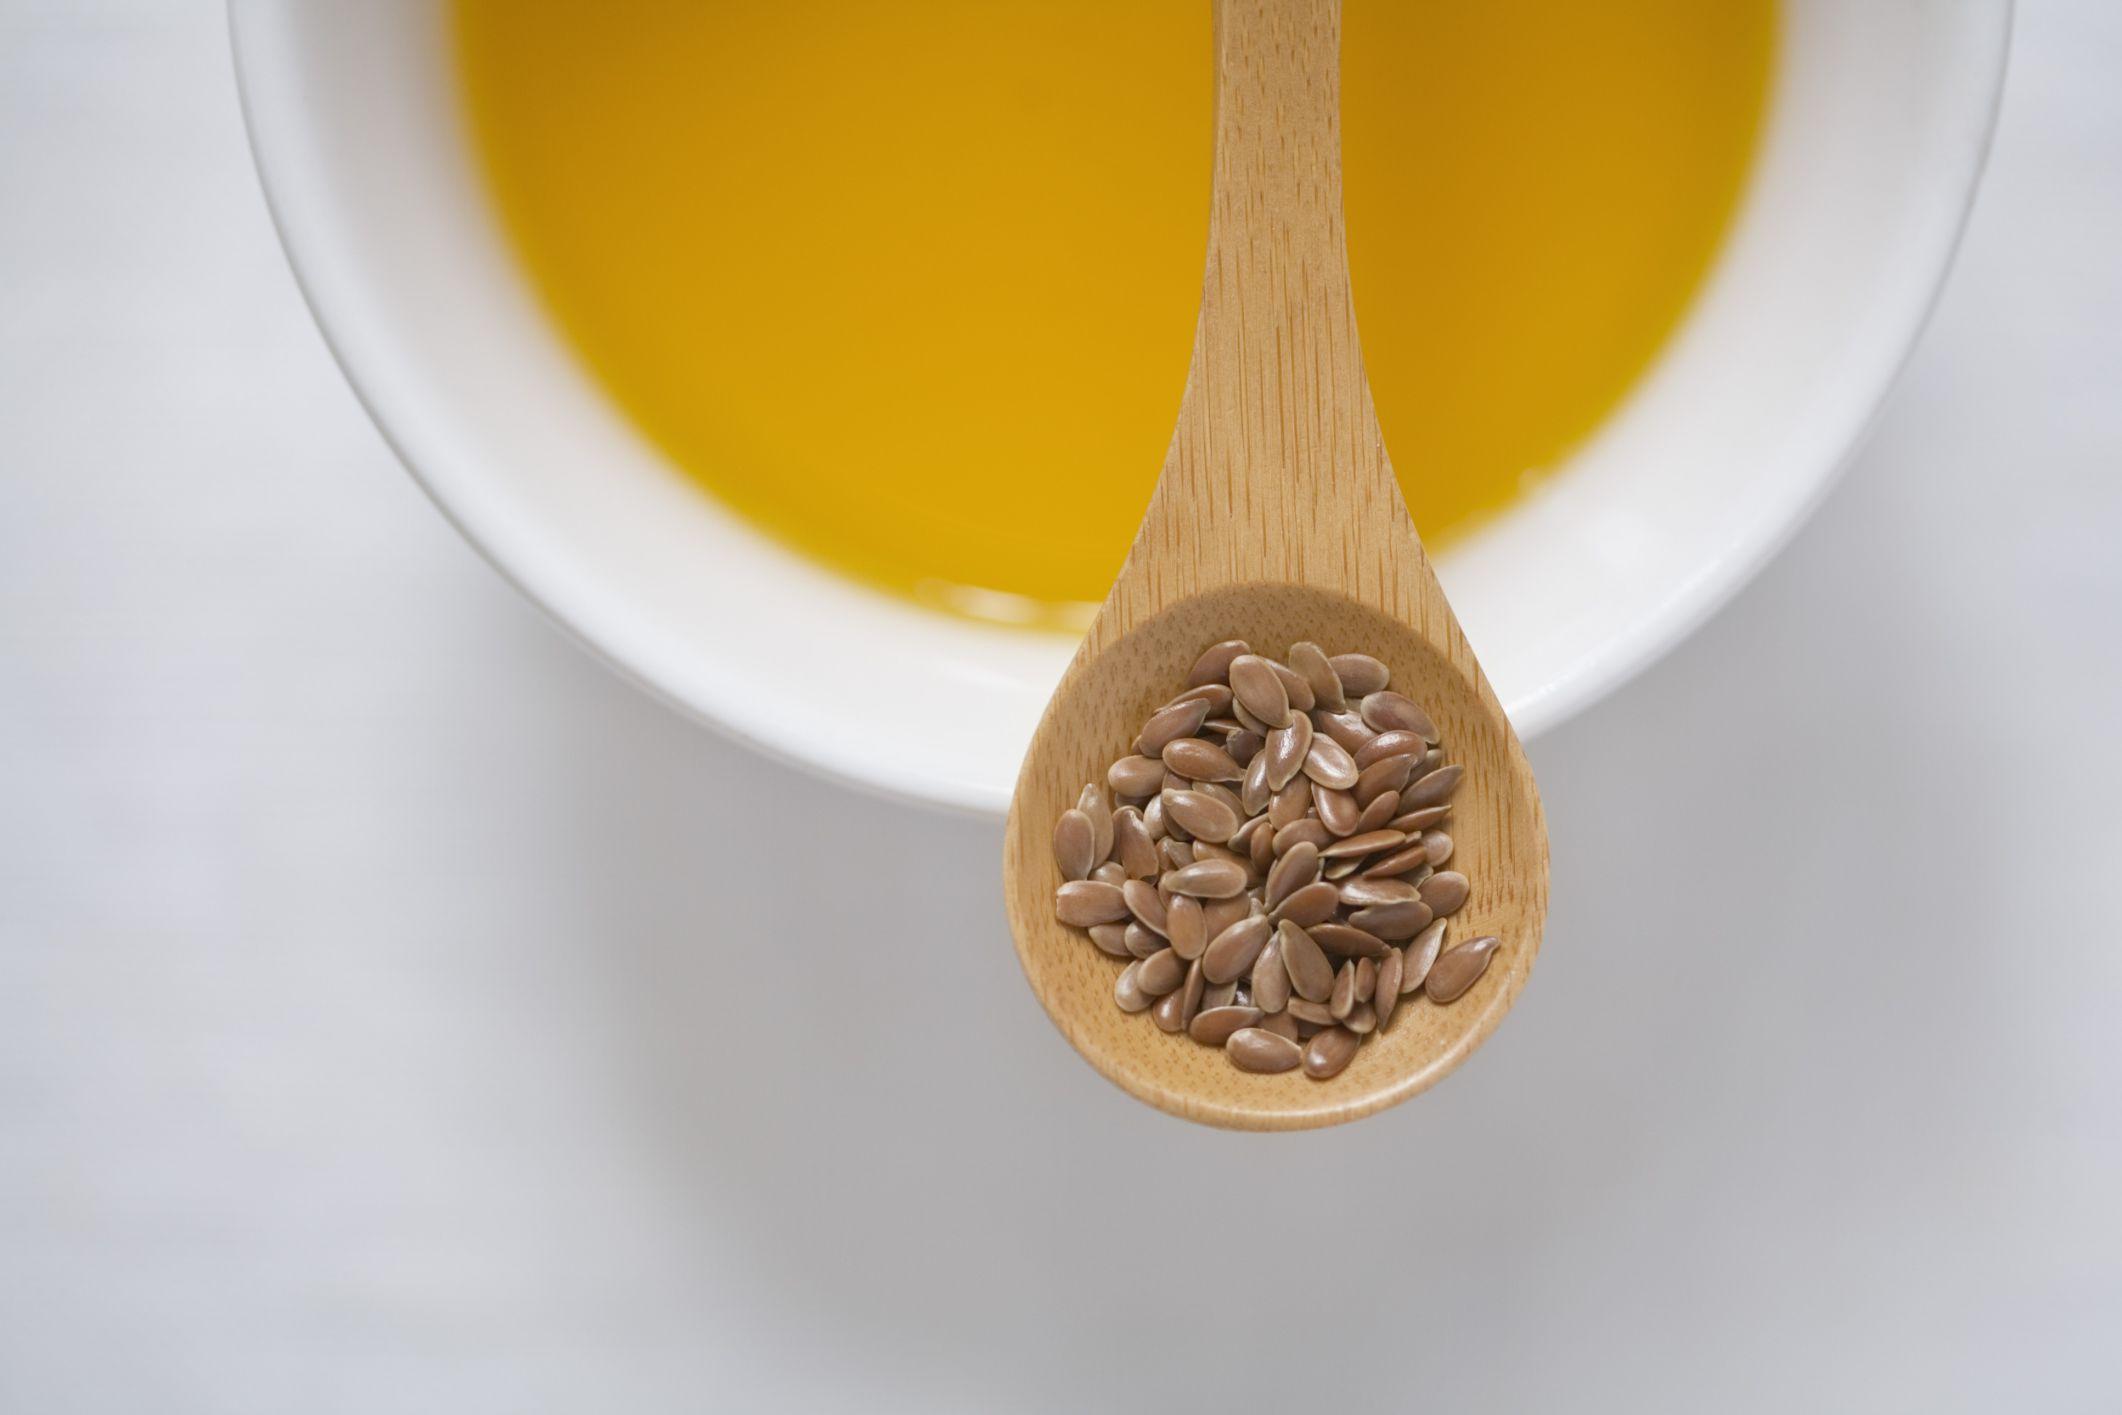 Plant Sources of Omega-3 Fatty Acids